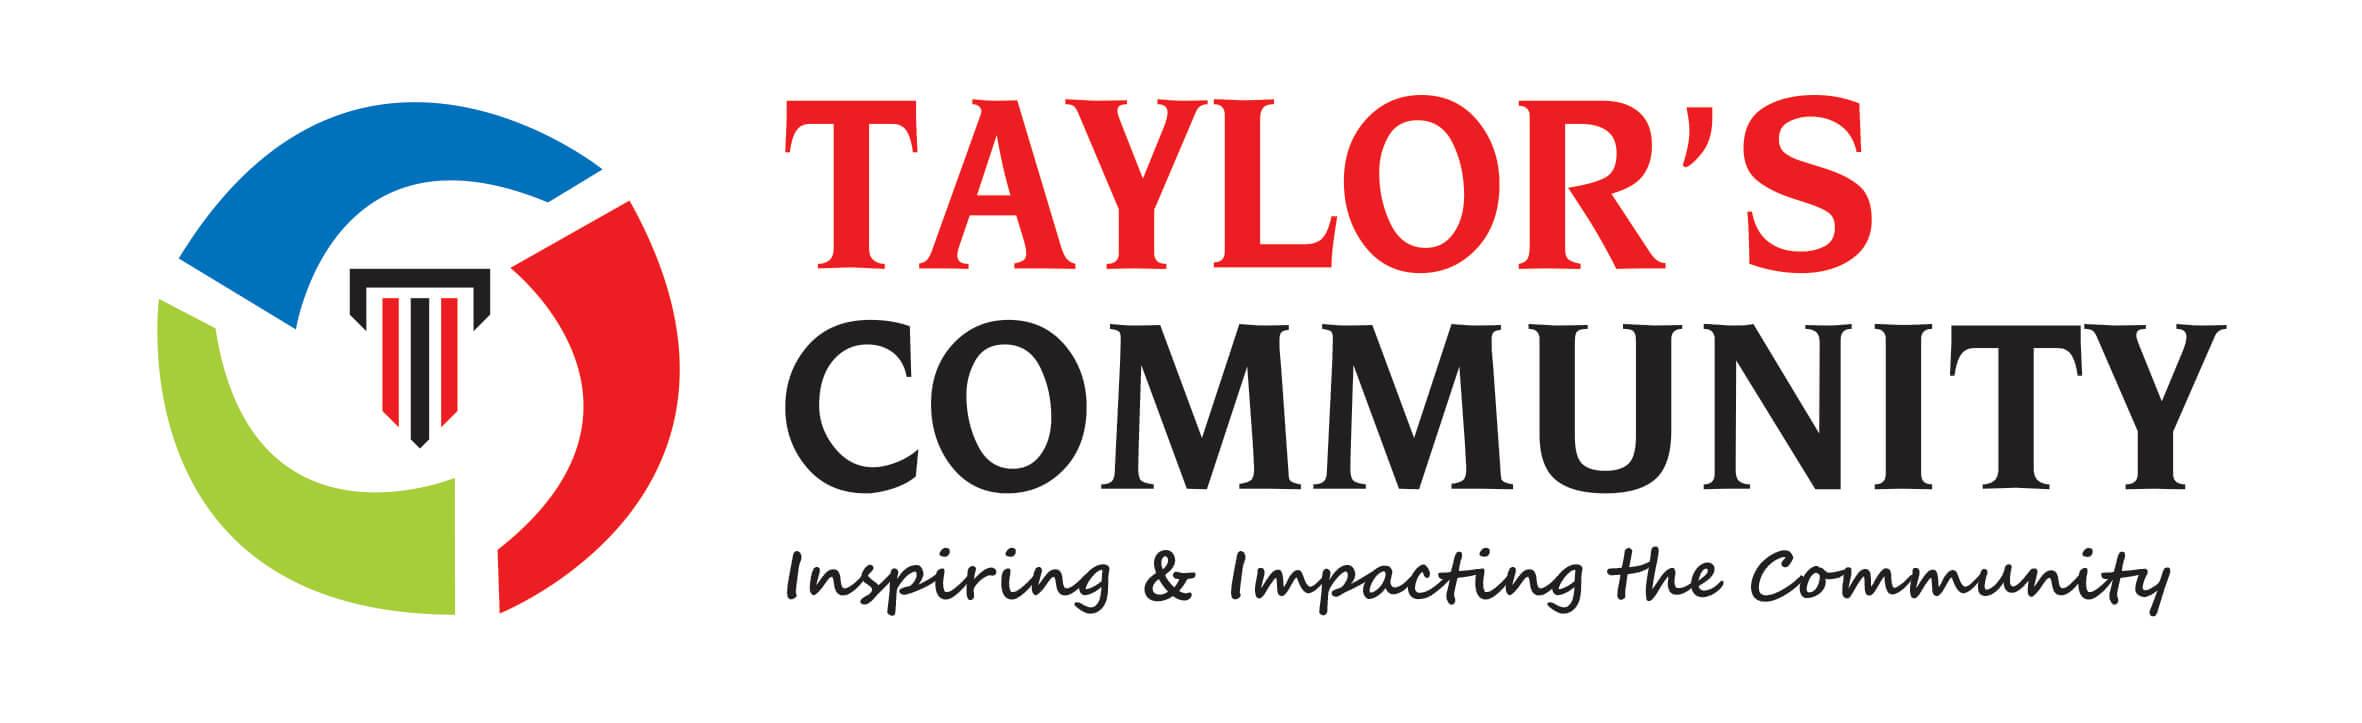 Taylor's Community